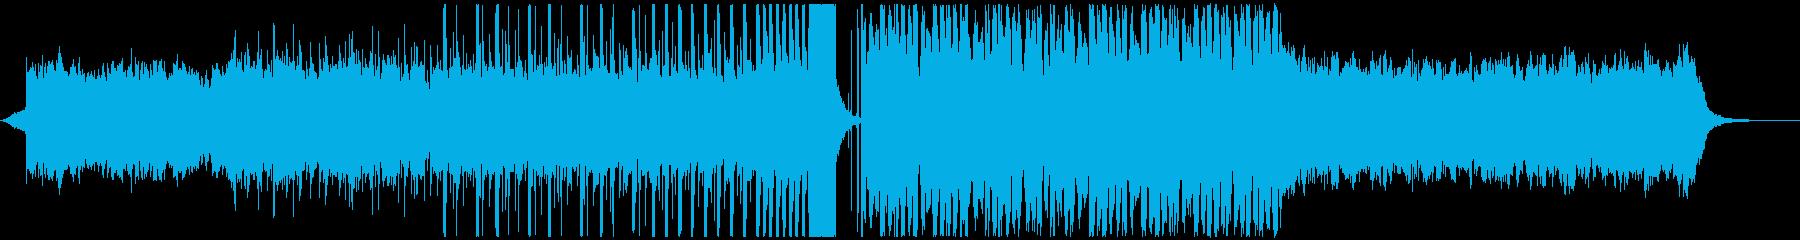 FuturePop2、お洒落、洋楽、夏Hの再生済みの波形